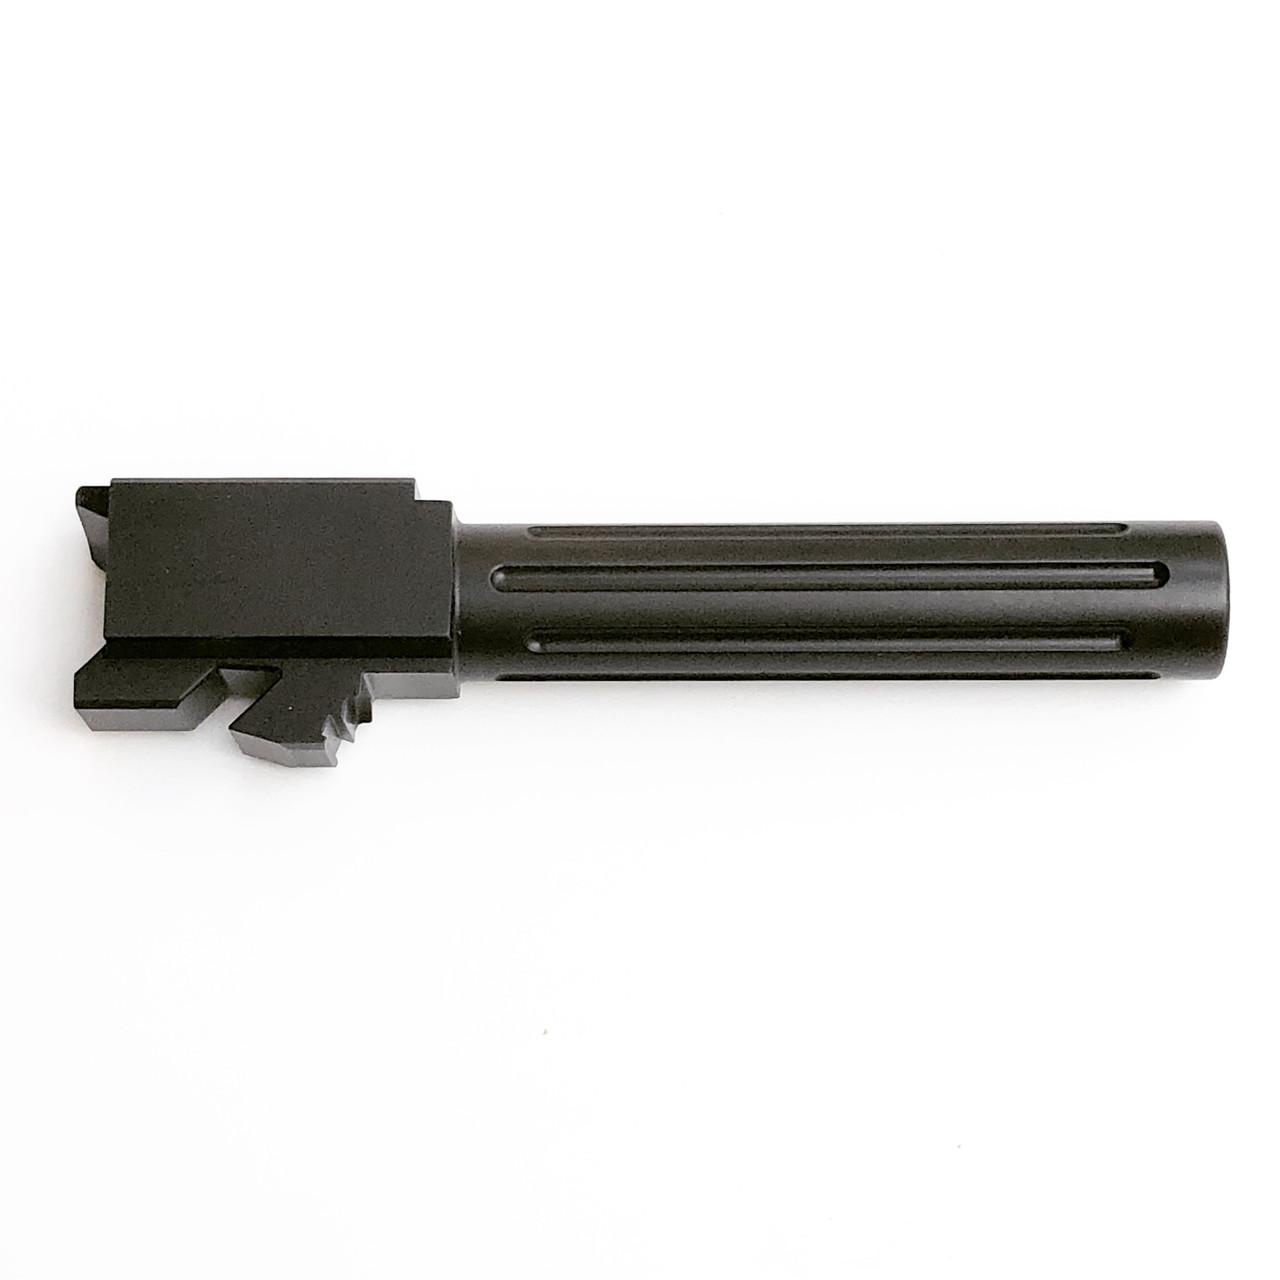 G19 Black Nitride Fluted Barrel for Glock 19 9mm Stock Length Made in USA